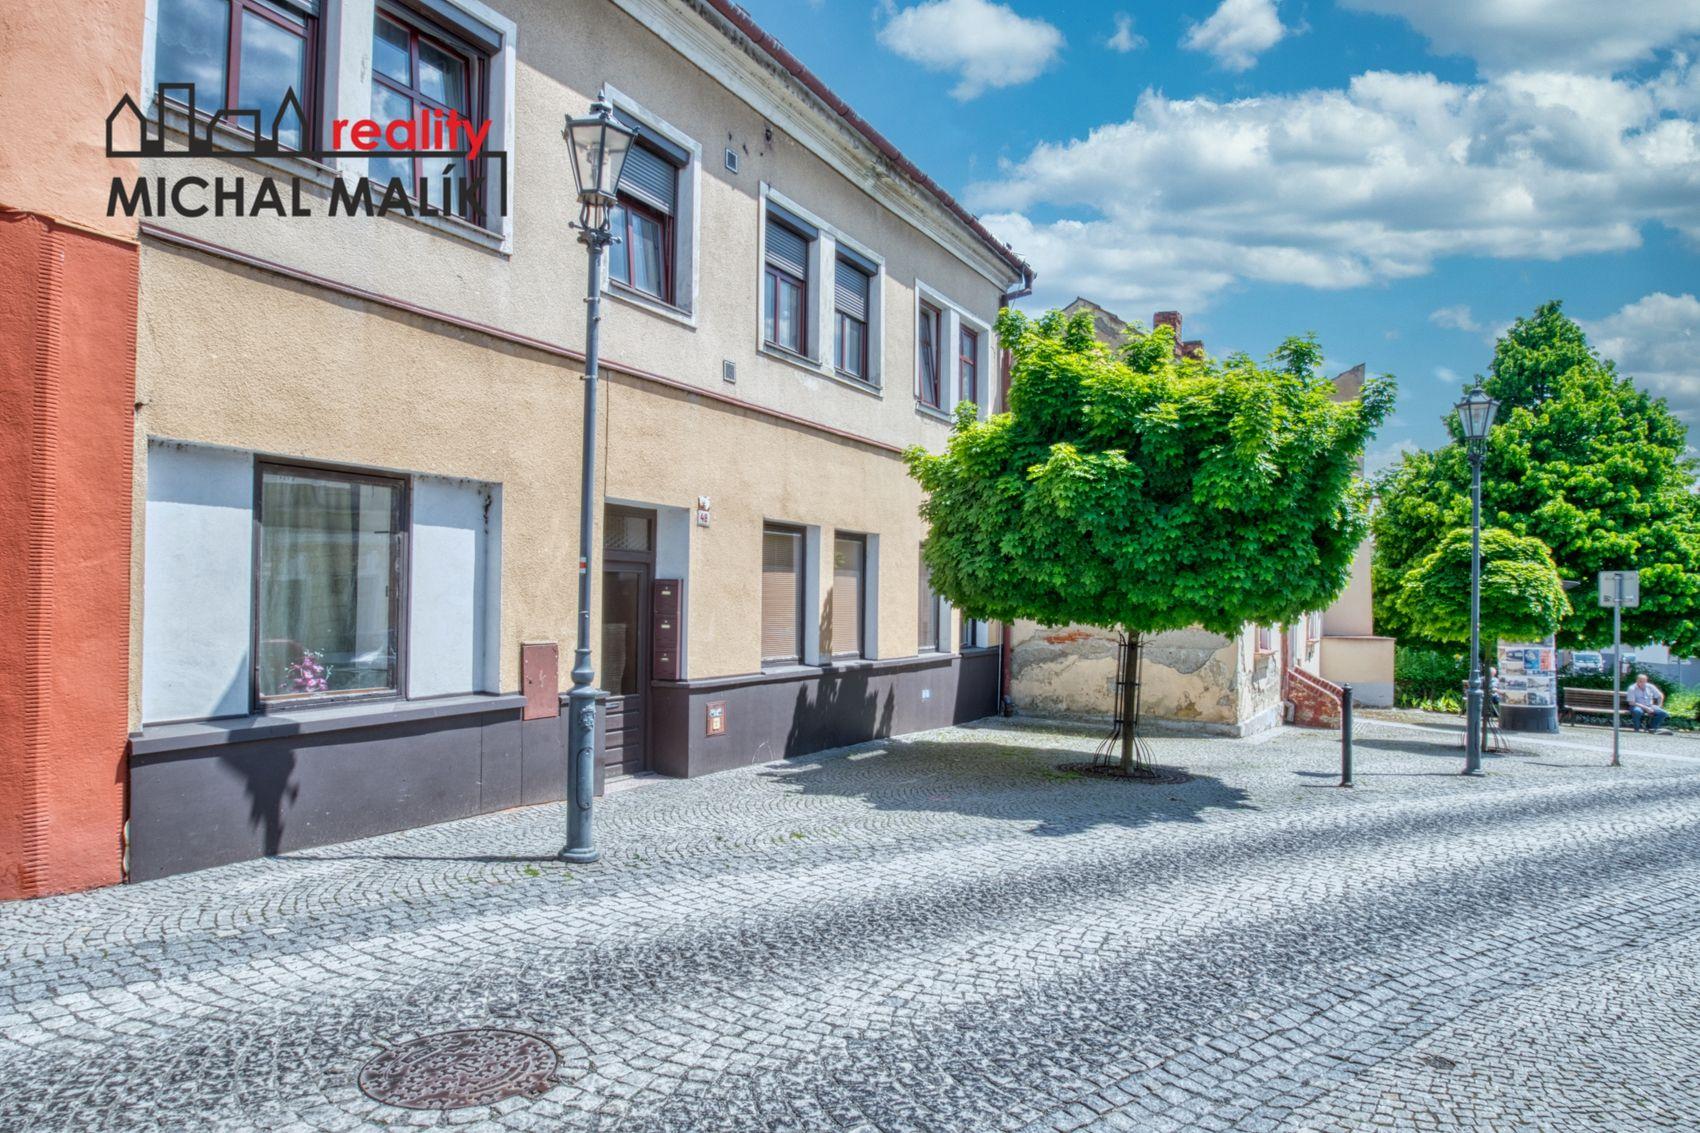 Prodej bytu 2+1 se zahradou, 50 m2, Svatoplukova, Hranice